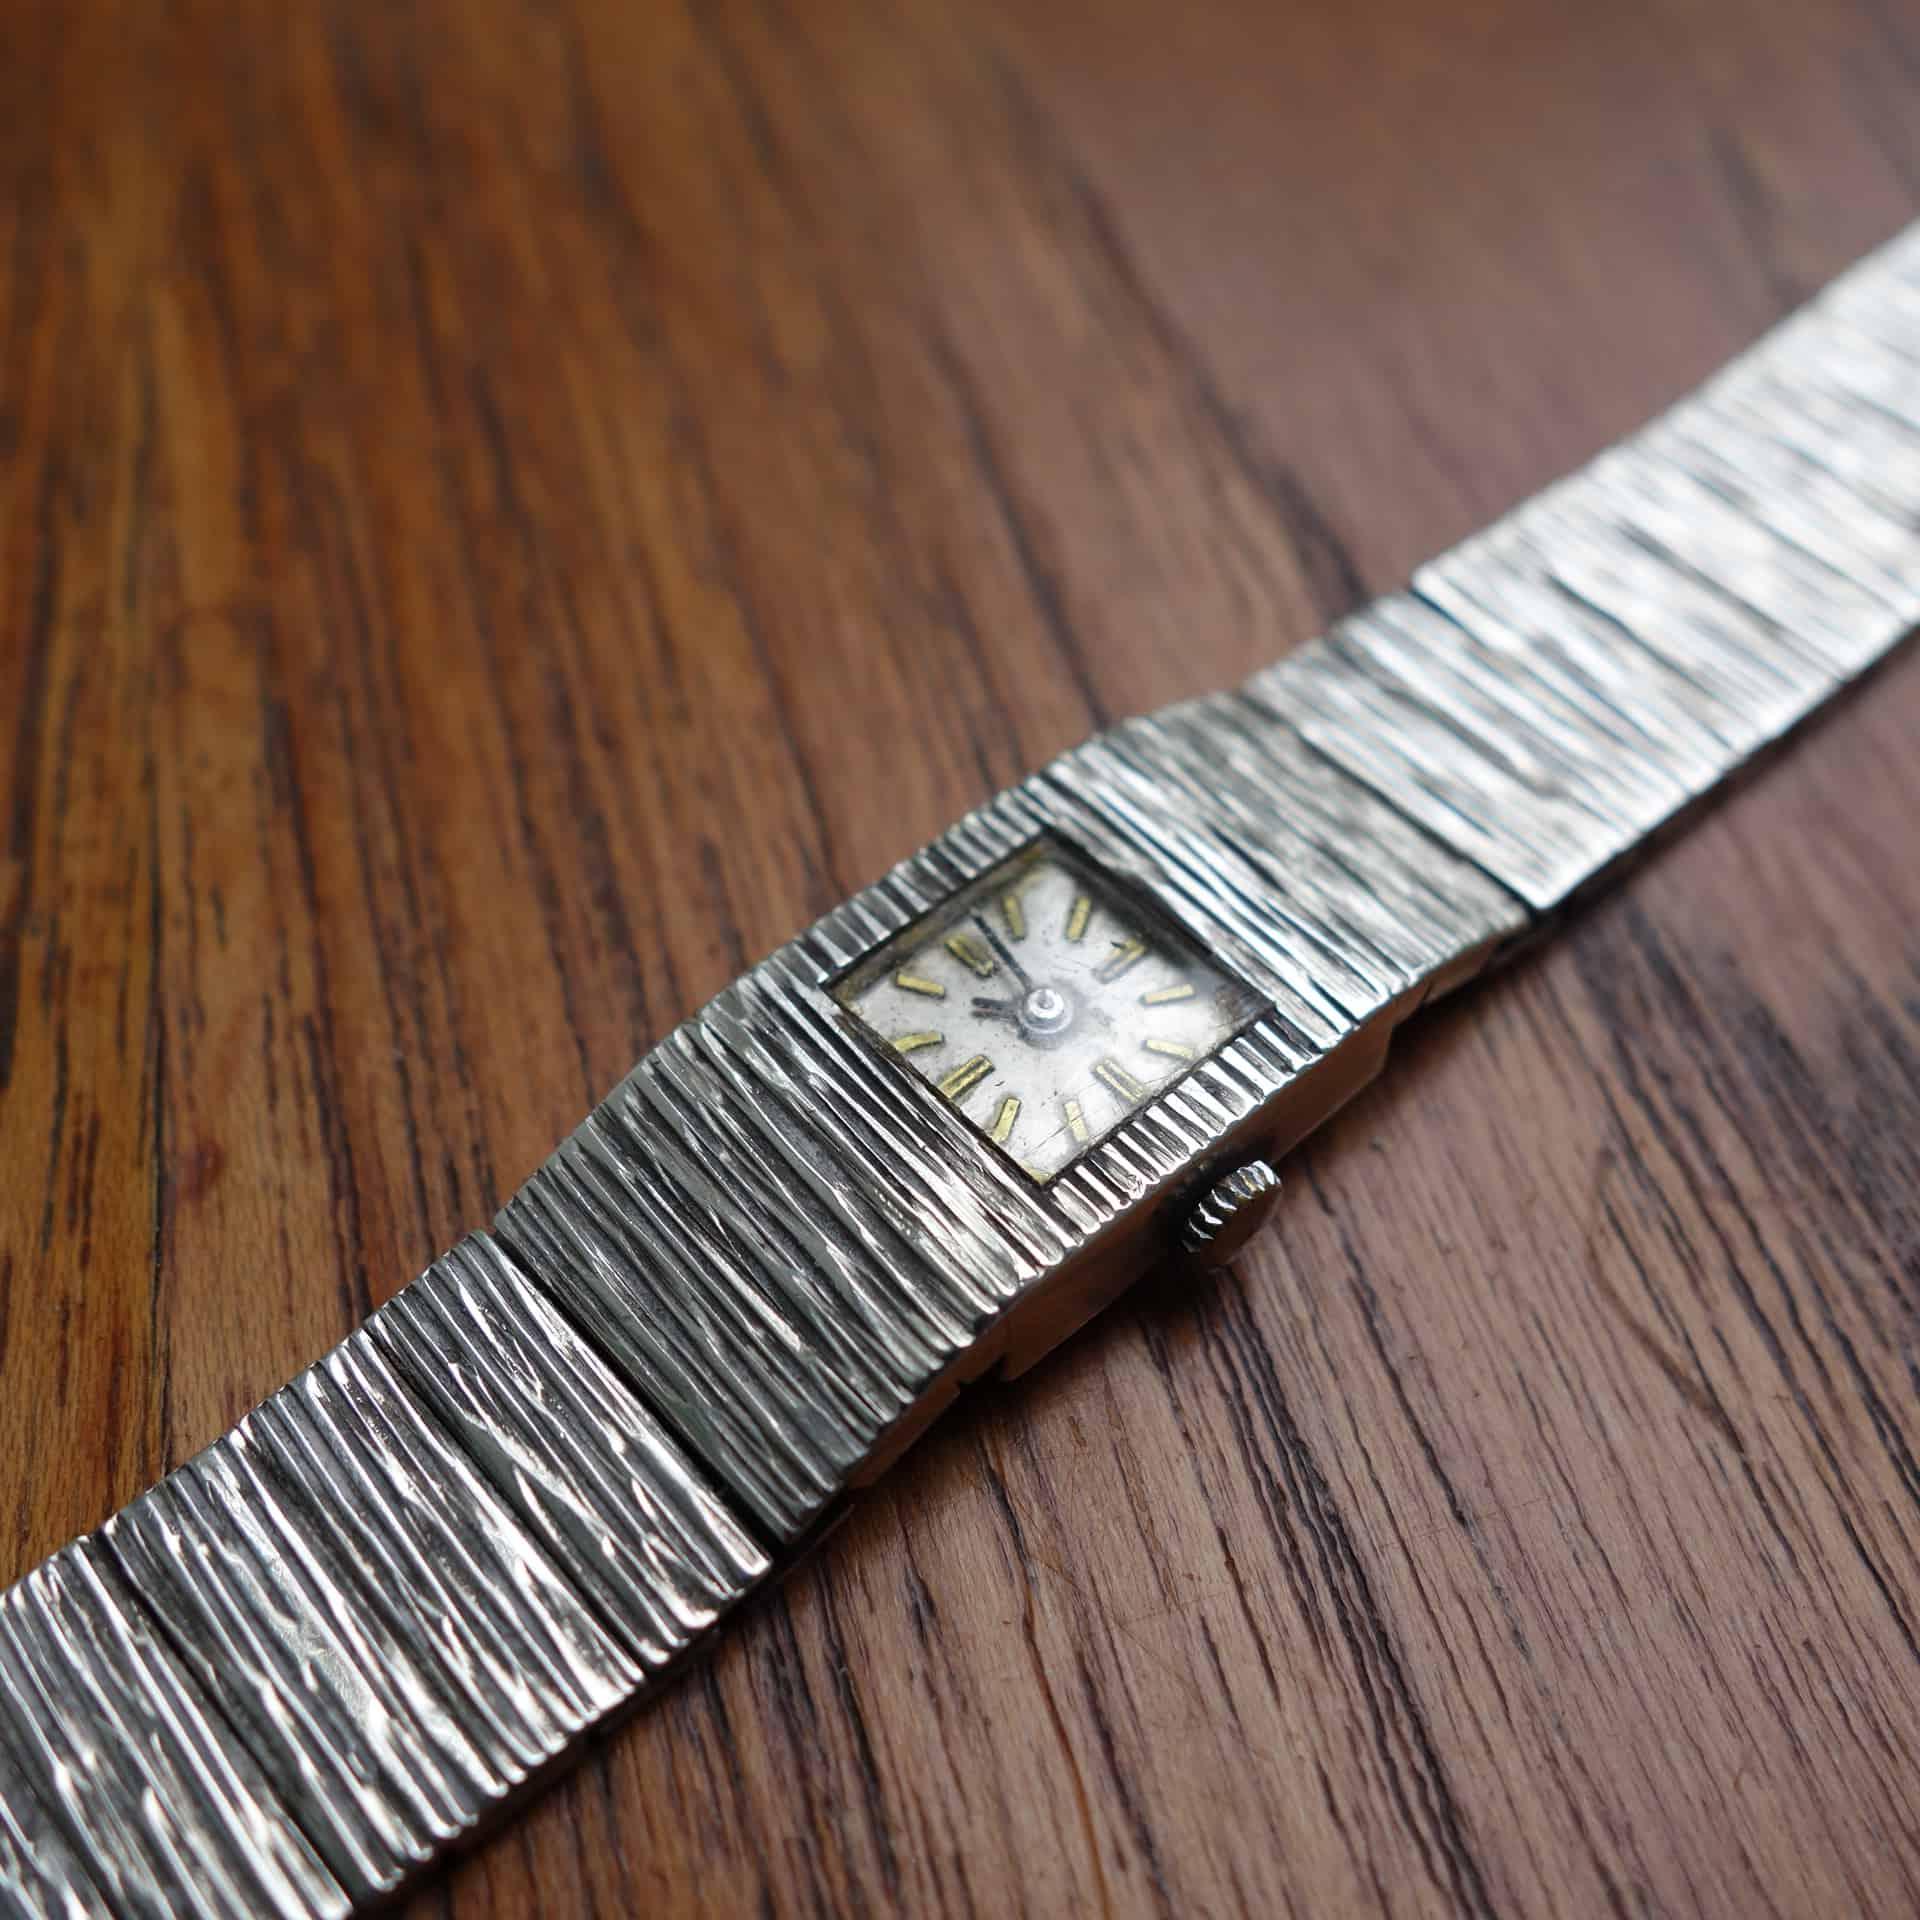 1960s silver Benney style Swiss watch